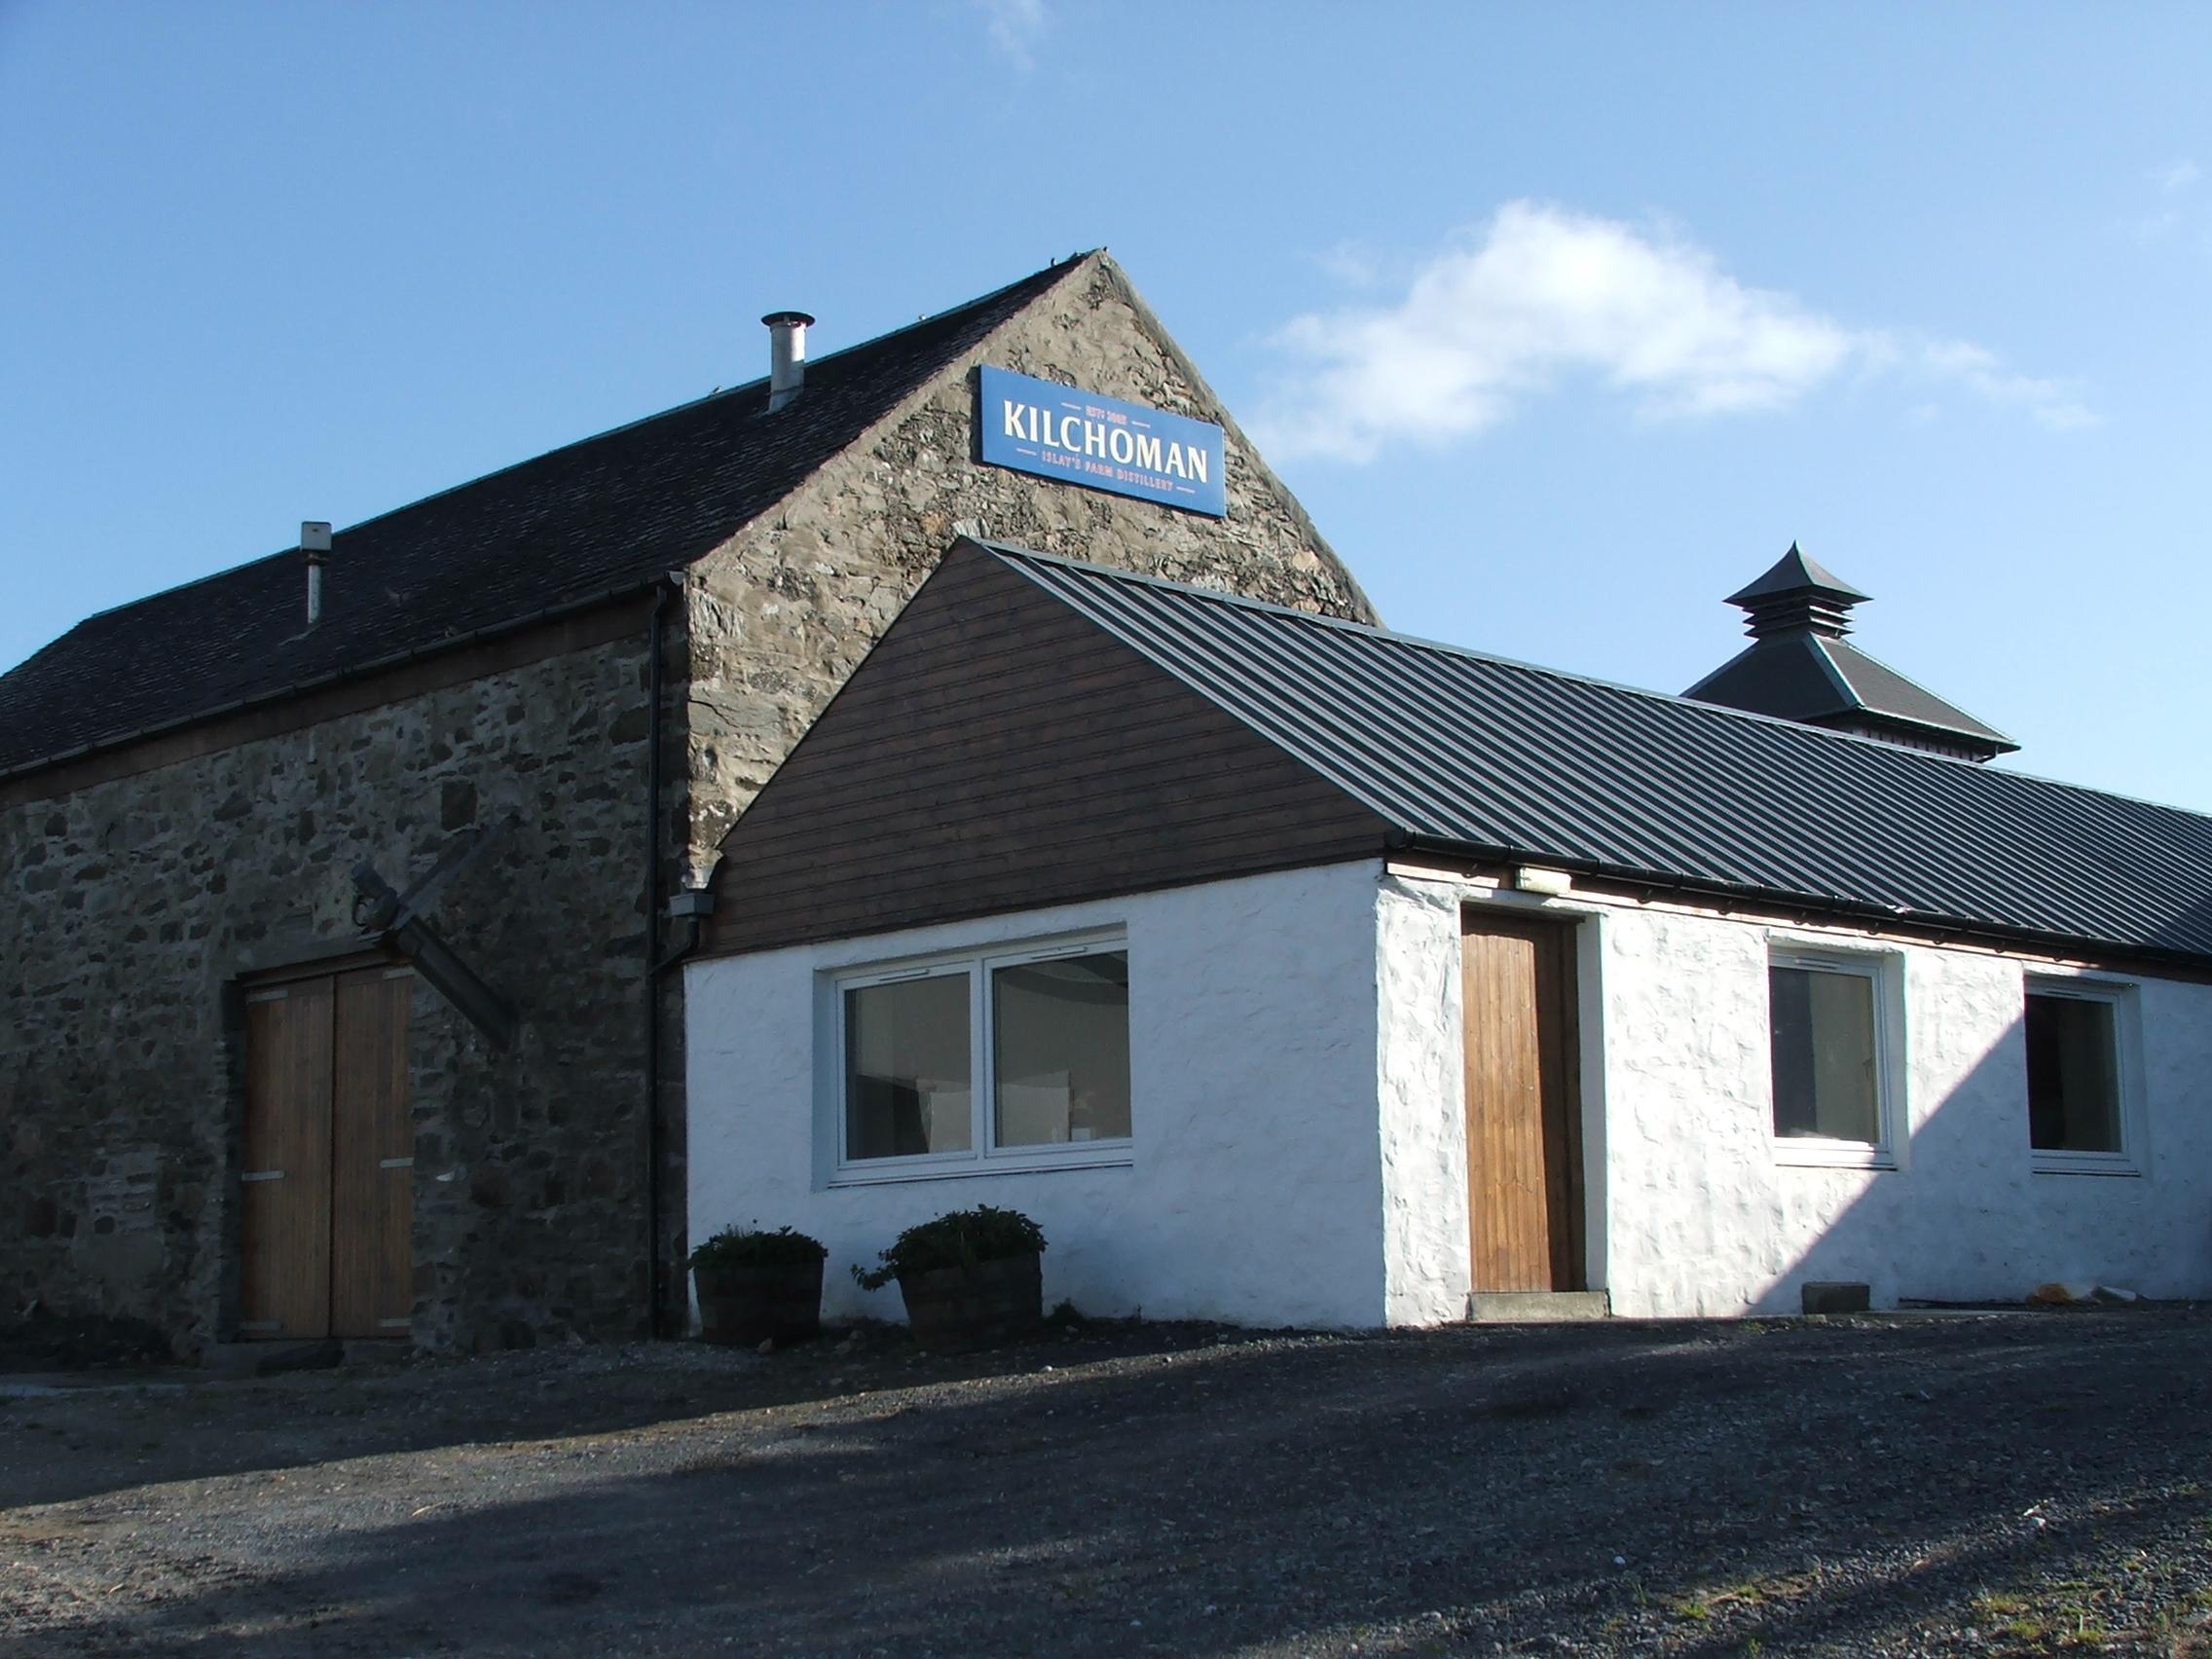 https://upload.wikimedia.org/wikipedia/commons/a/ac/Kilchoman_Distillery_on_Islay%2C_Scotland.jpg